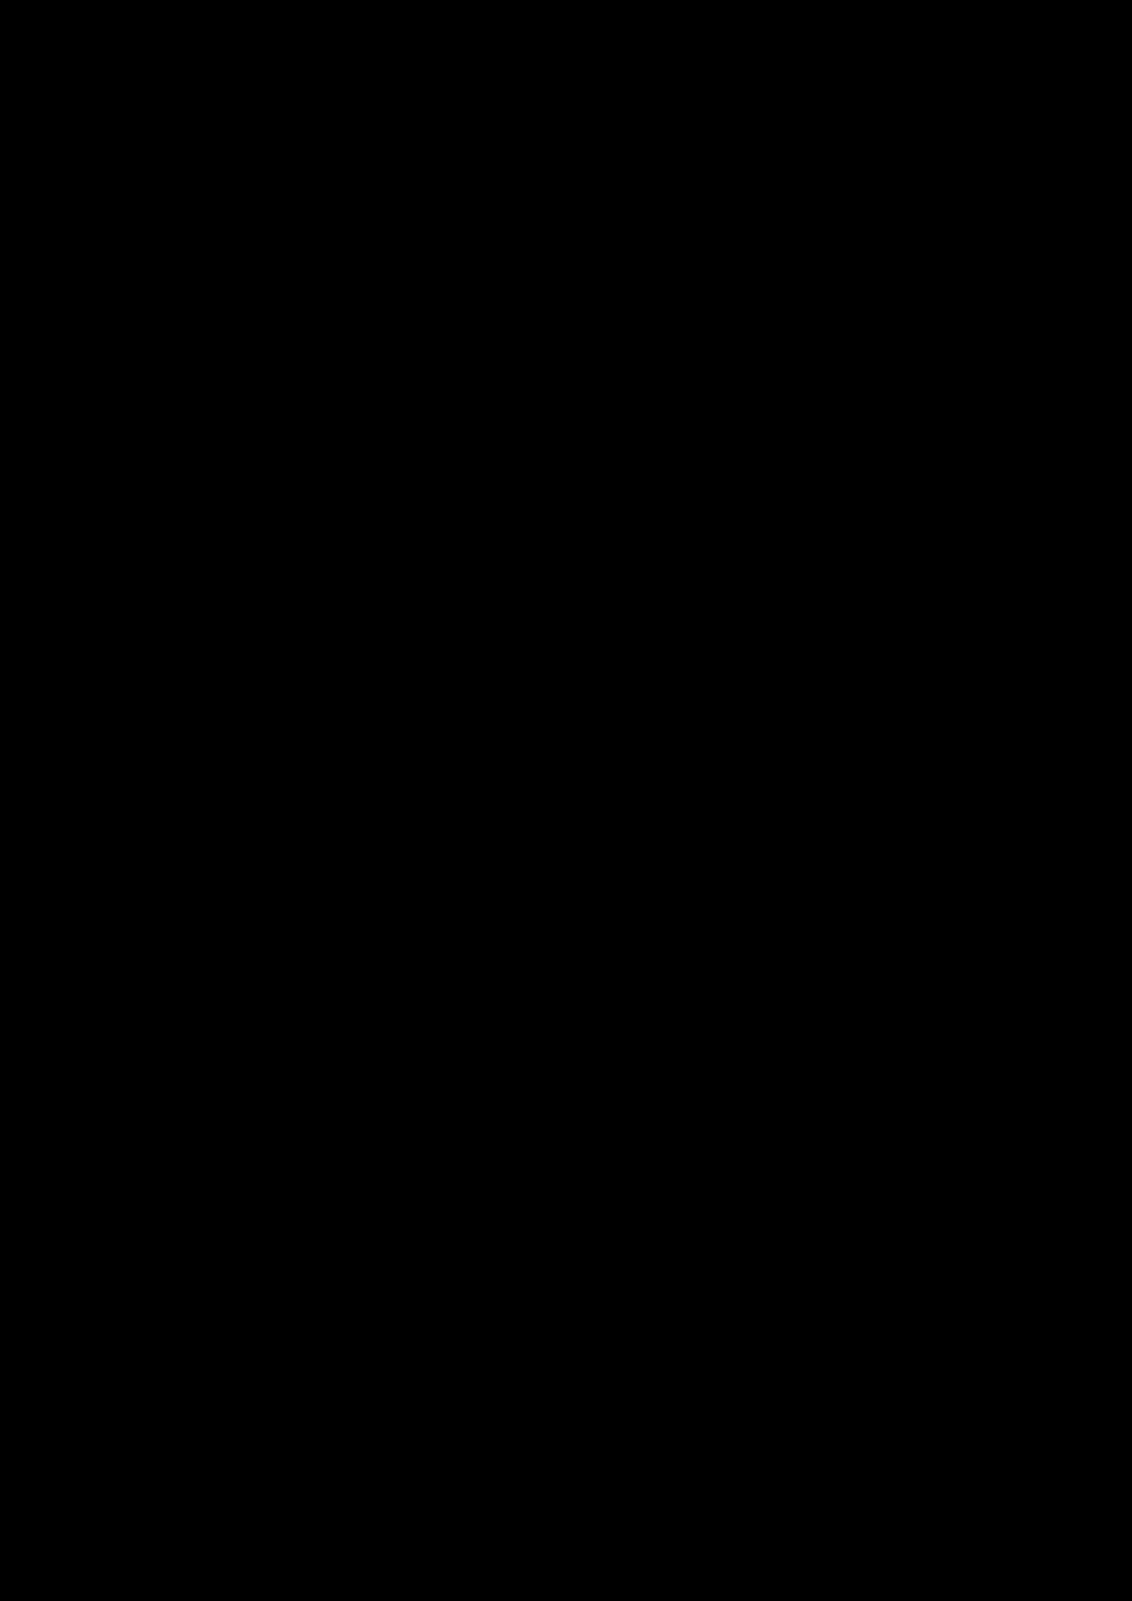 Korolevstvo slez slide, Image 77